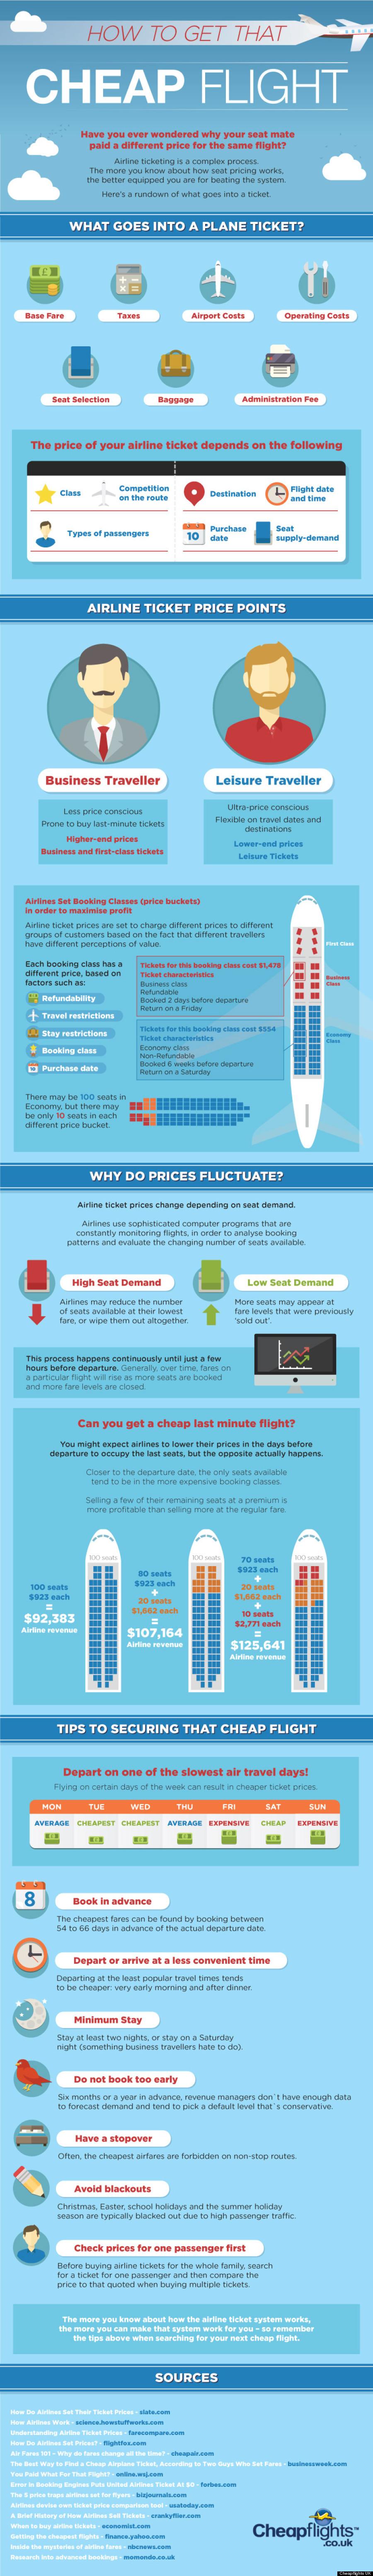 Watch How to Get Cheap Flights video